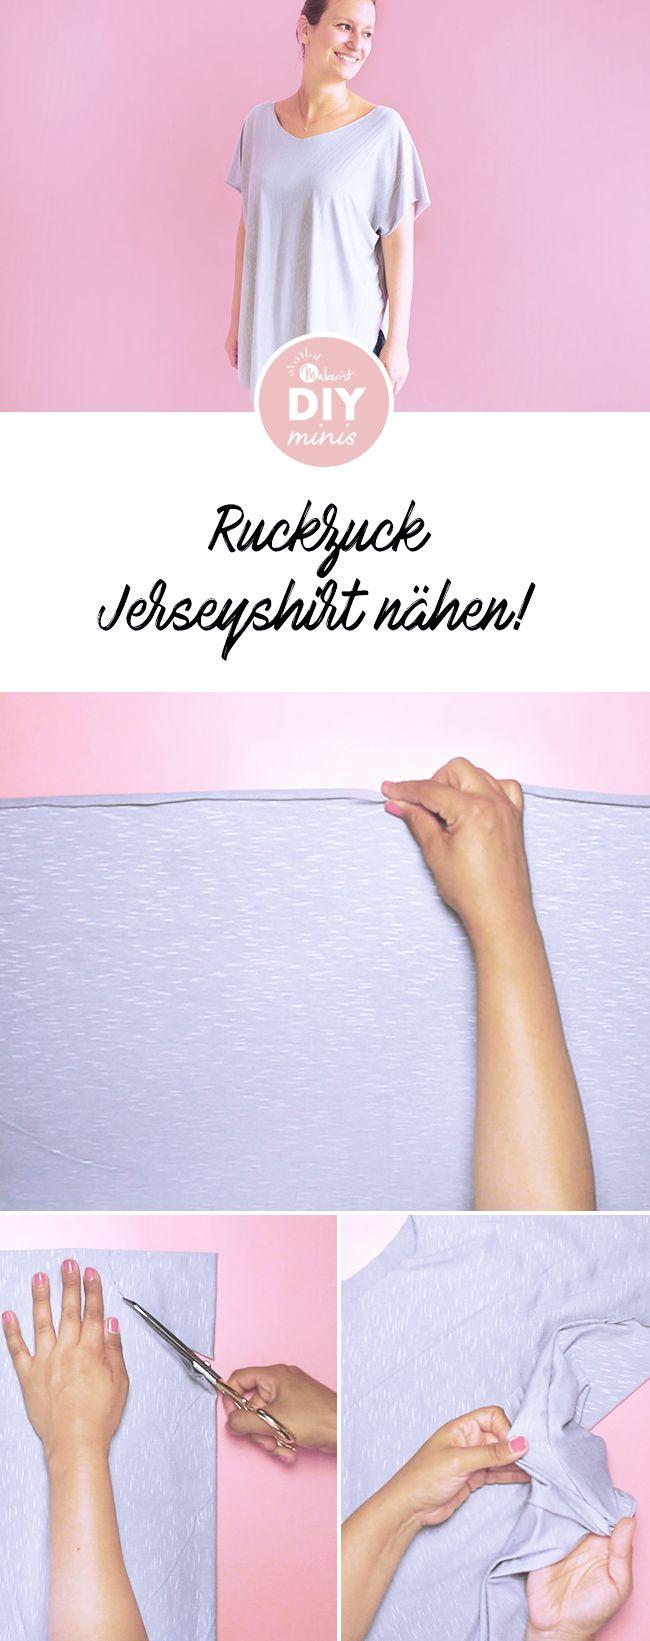 Jersey-Shirt in 5 Minuten nähen! Kostenlose Nähanleitung via Makerist.de